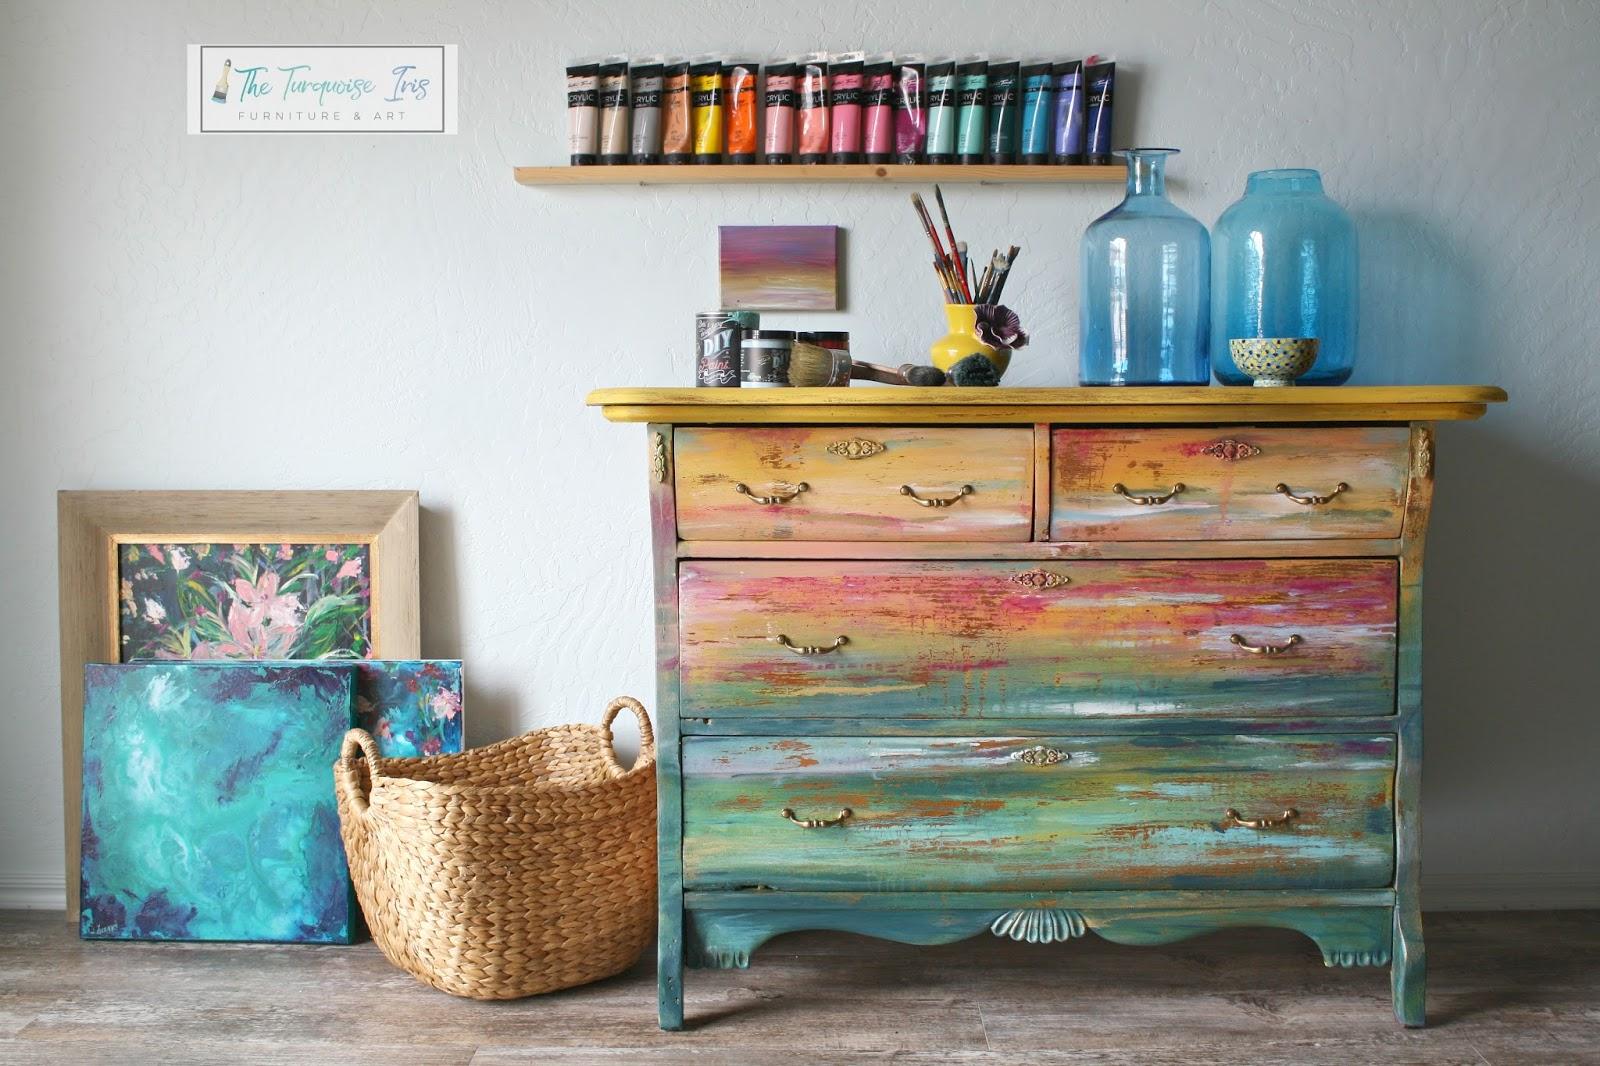 the turquoise iris furniture art rh theturquoiseiris blogspot com diy painted furniture ideas diy painted furniture ideas